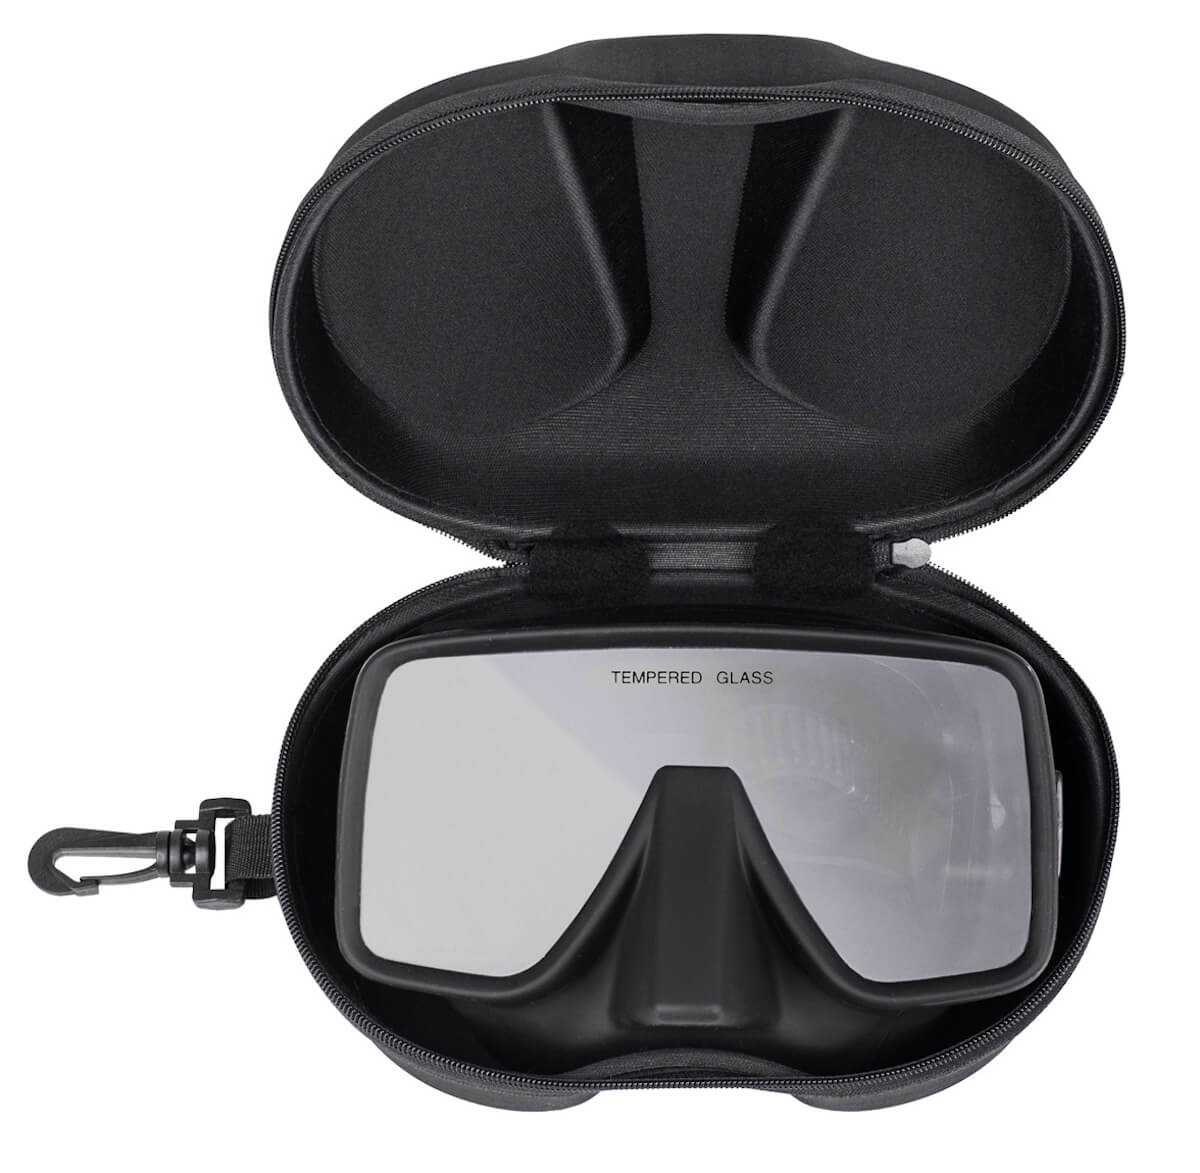 Potápěčská maska Finnsub View black v krabičce